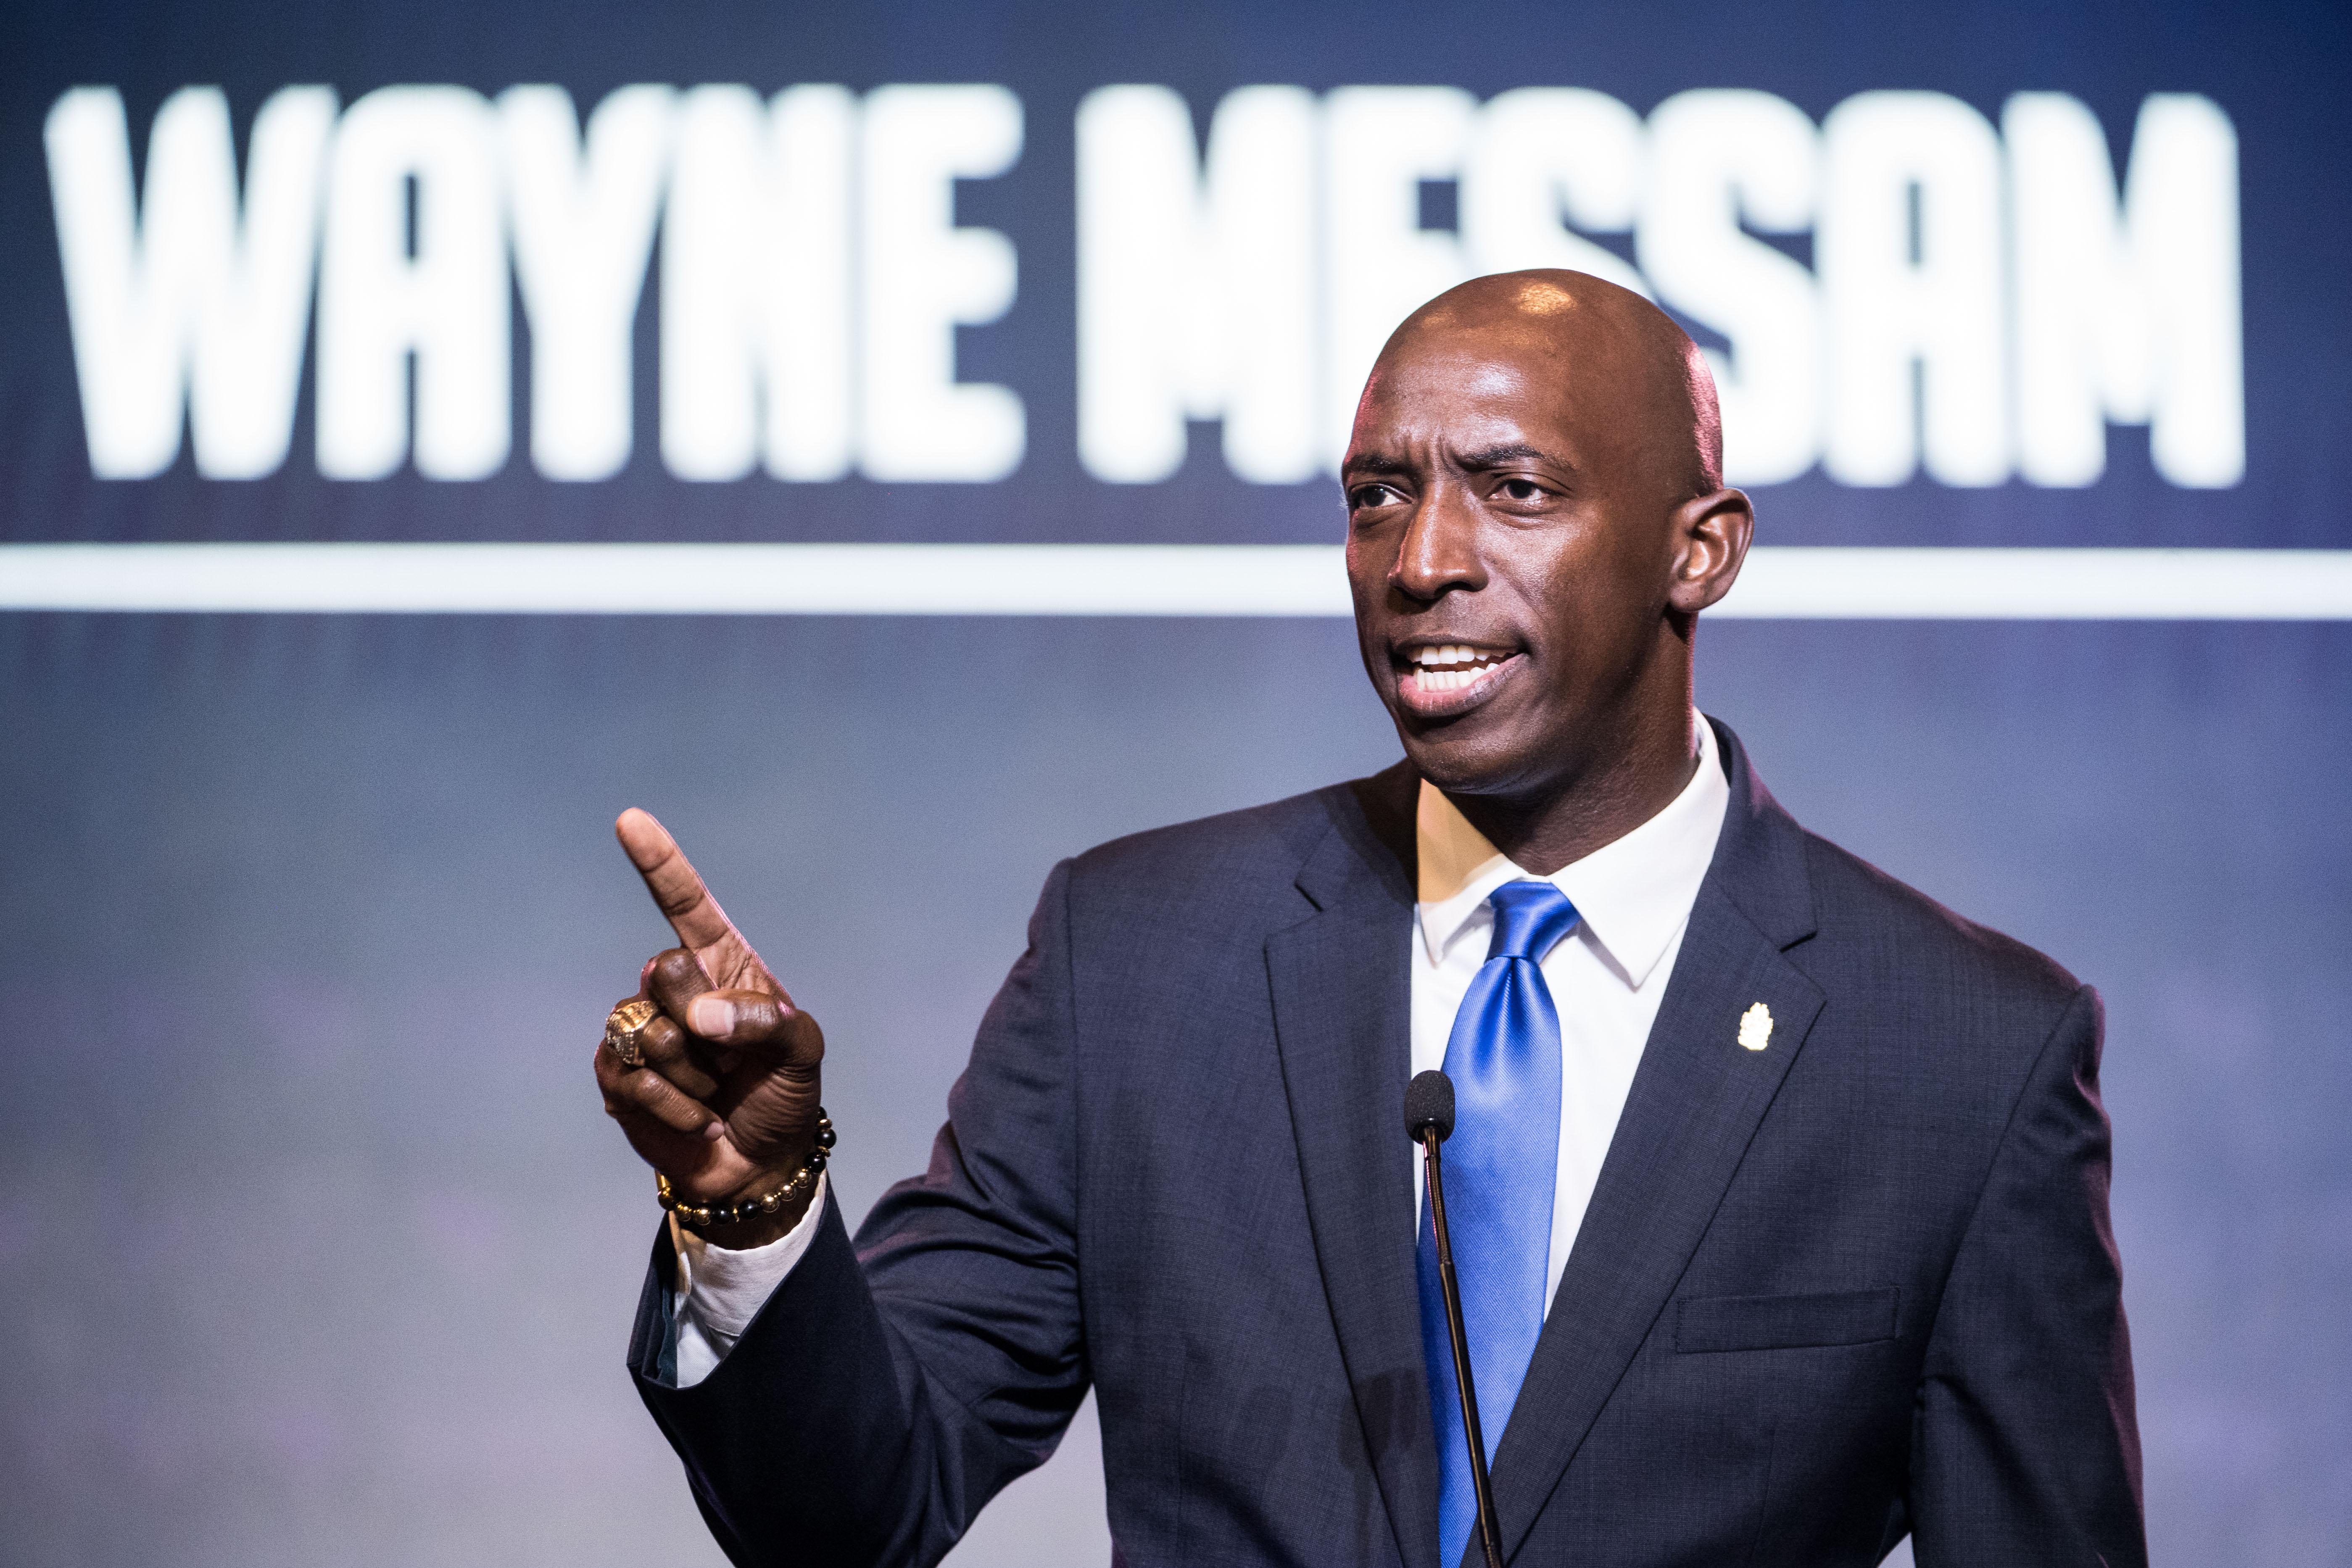 Florida Mayor Wayne Messam Drops out of 2020 Race